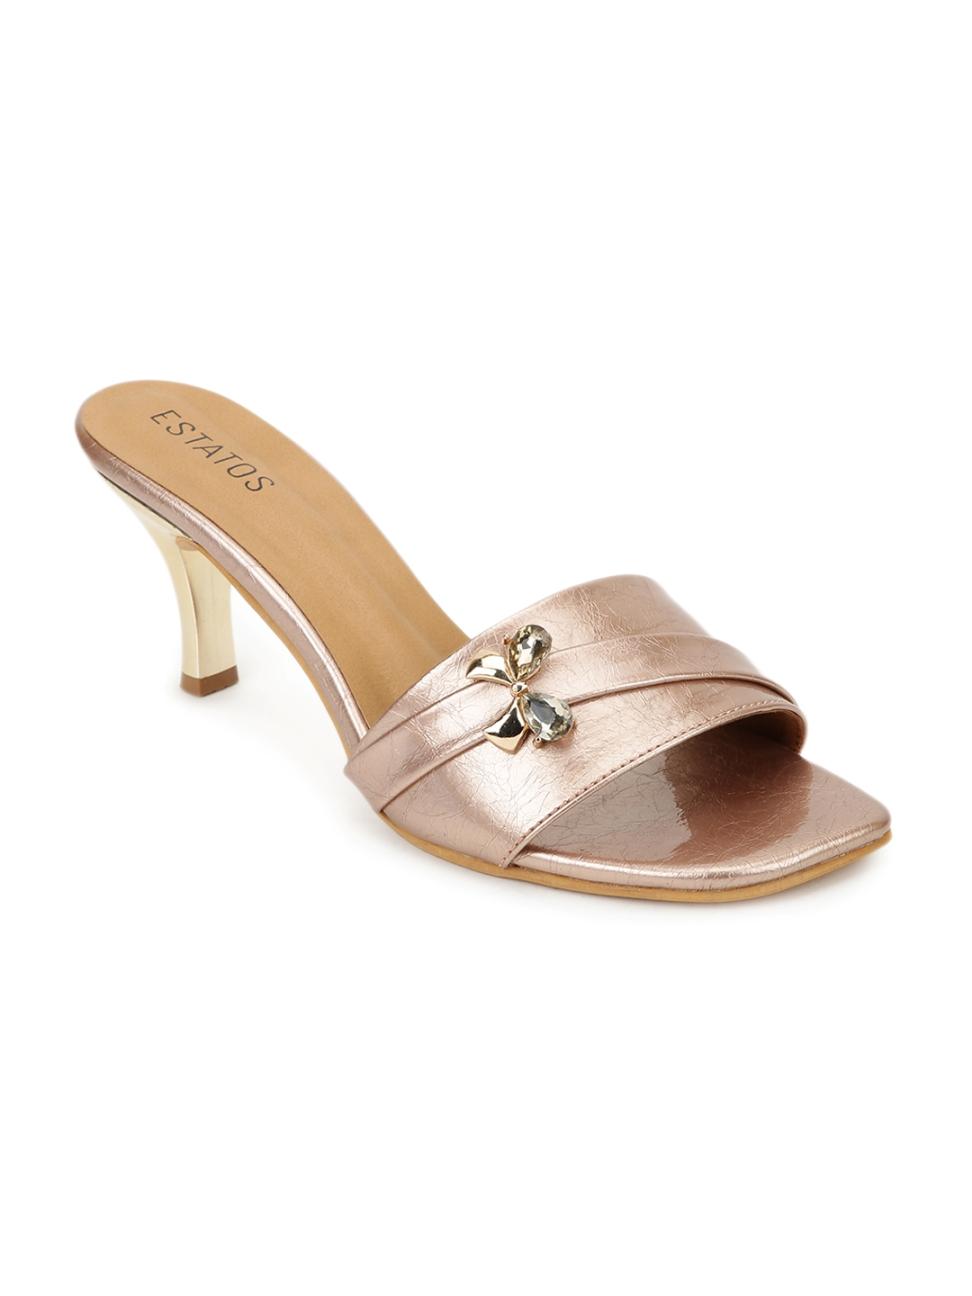 ESTATOS | Estatos Synthetic Leather Pointed Heeled Peach Sandal